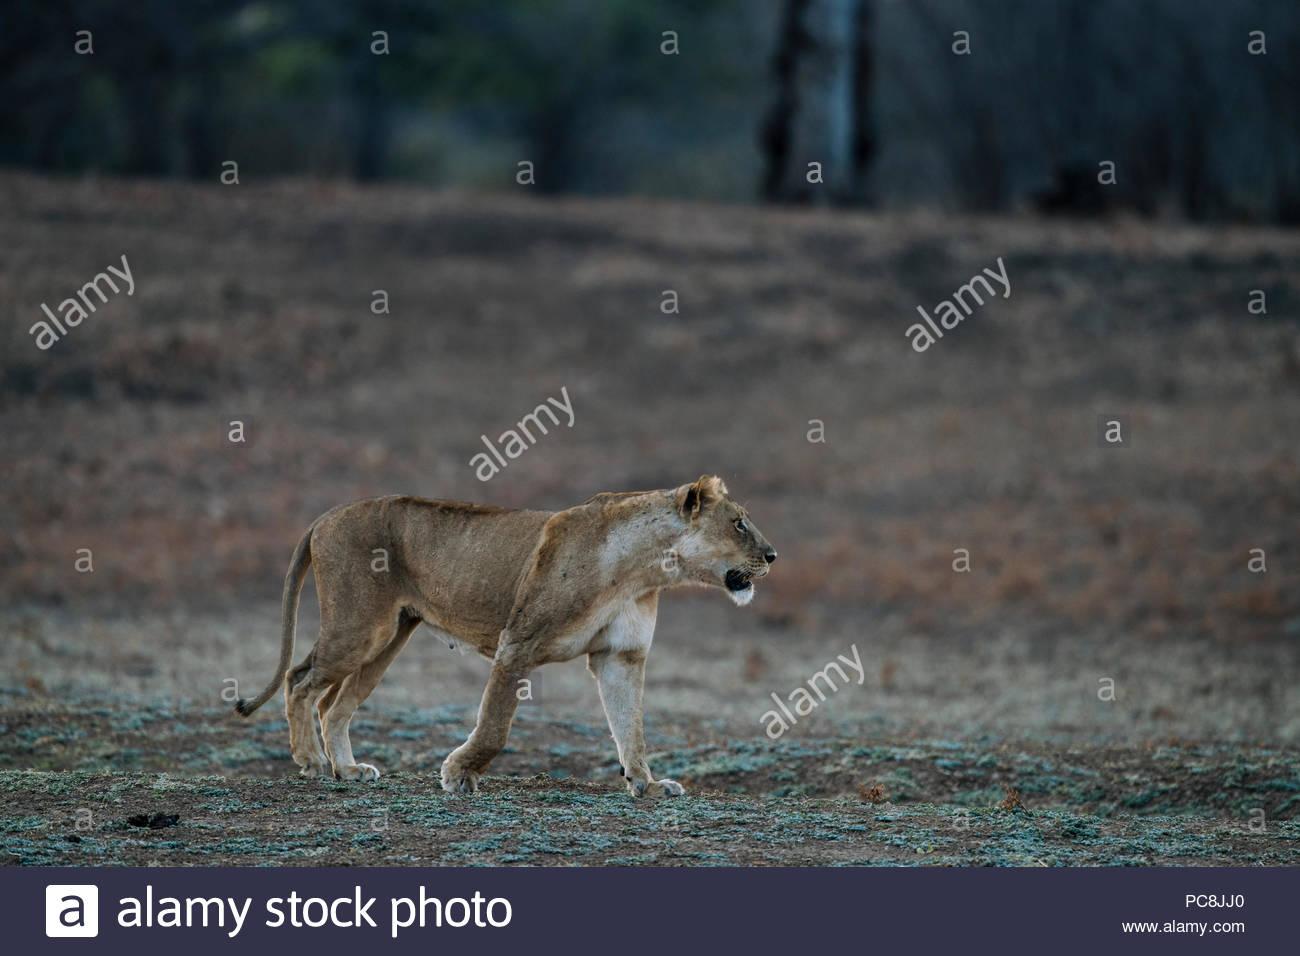 A lioness, Panthera leo, walking at sunset. - Stock Image